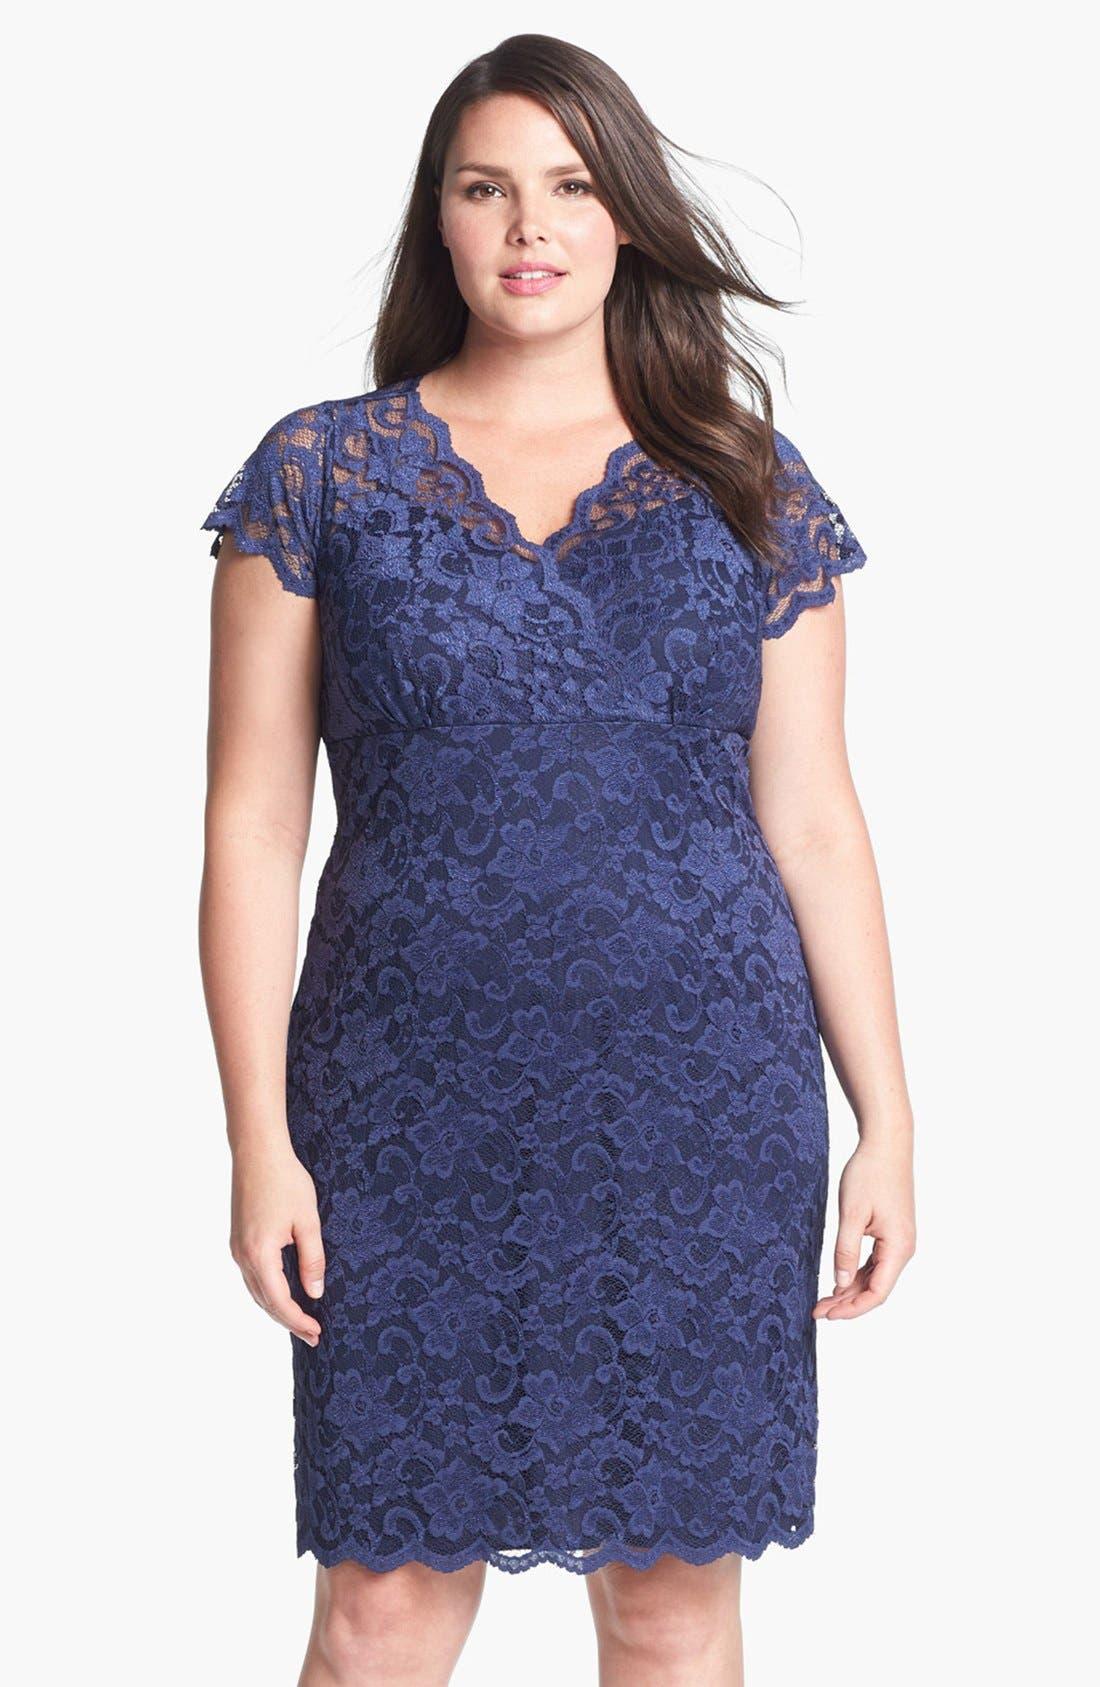 Alternate Image 1 Selected - MARINA Lace Sheath Dress (Plus Size)